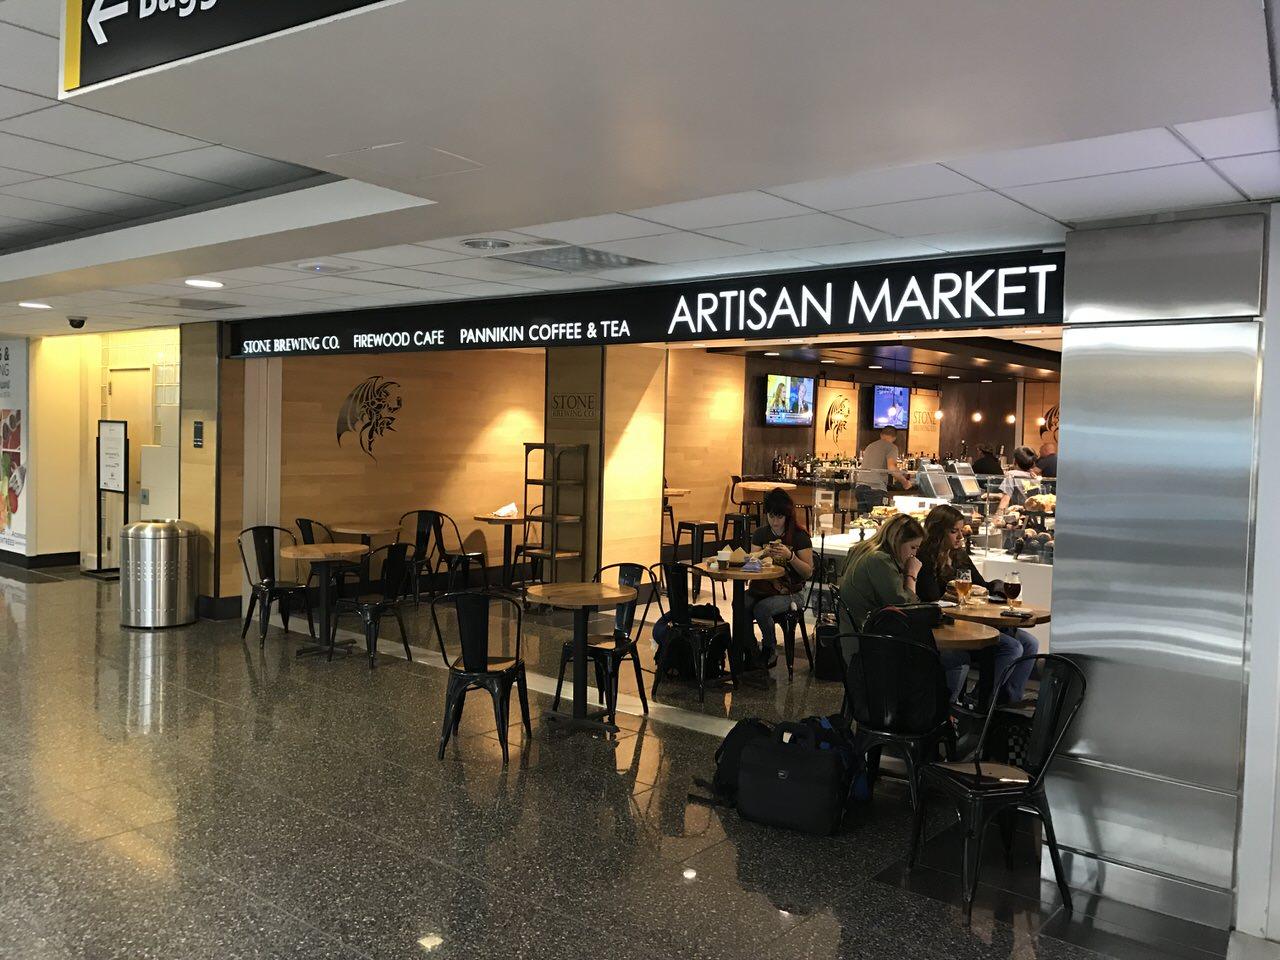 「STONE BREWING CO.」サンディエゴ空港のクラフトビールの店 #AdobeMAX